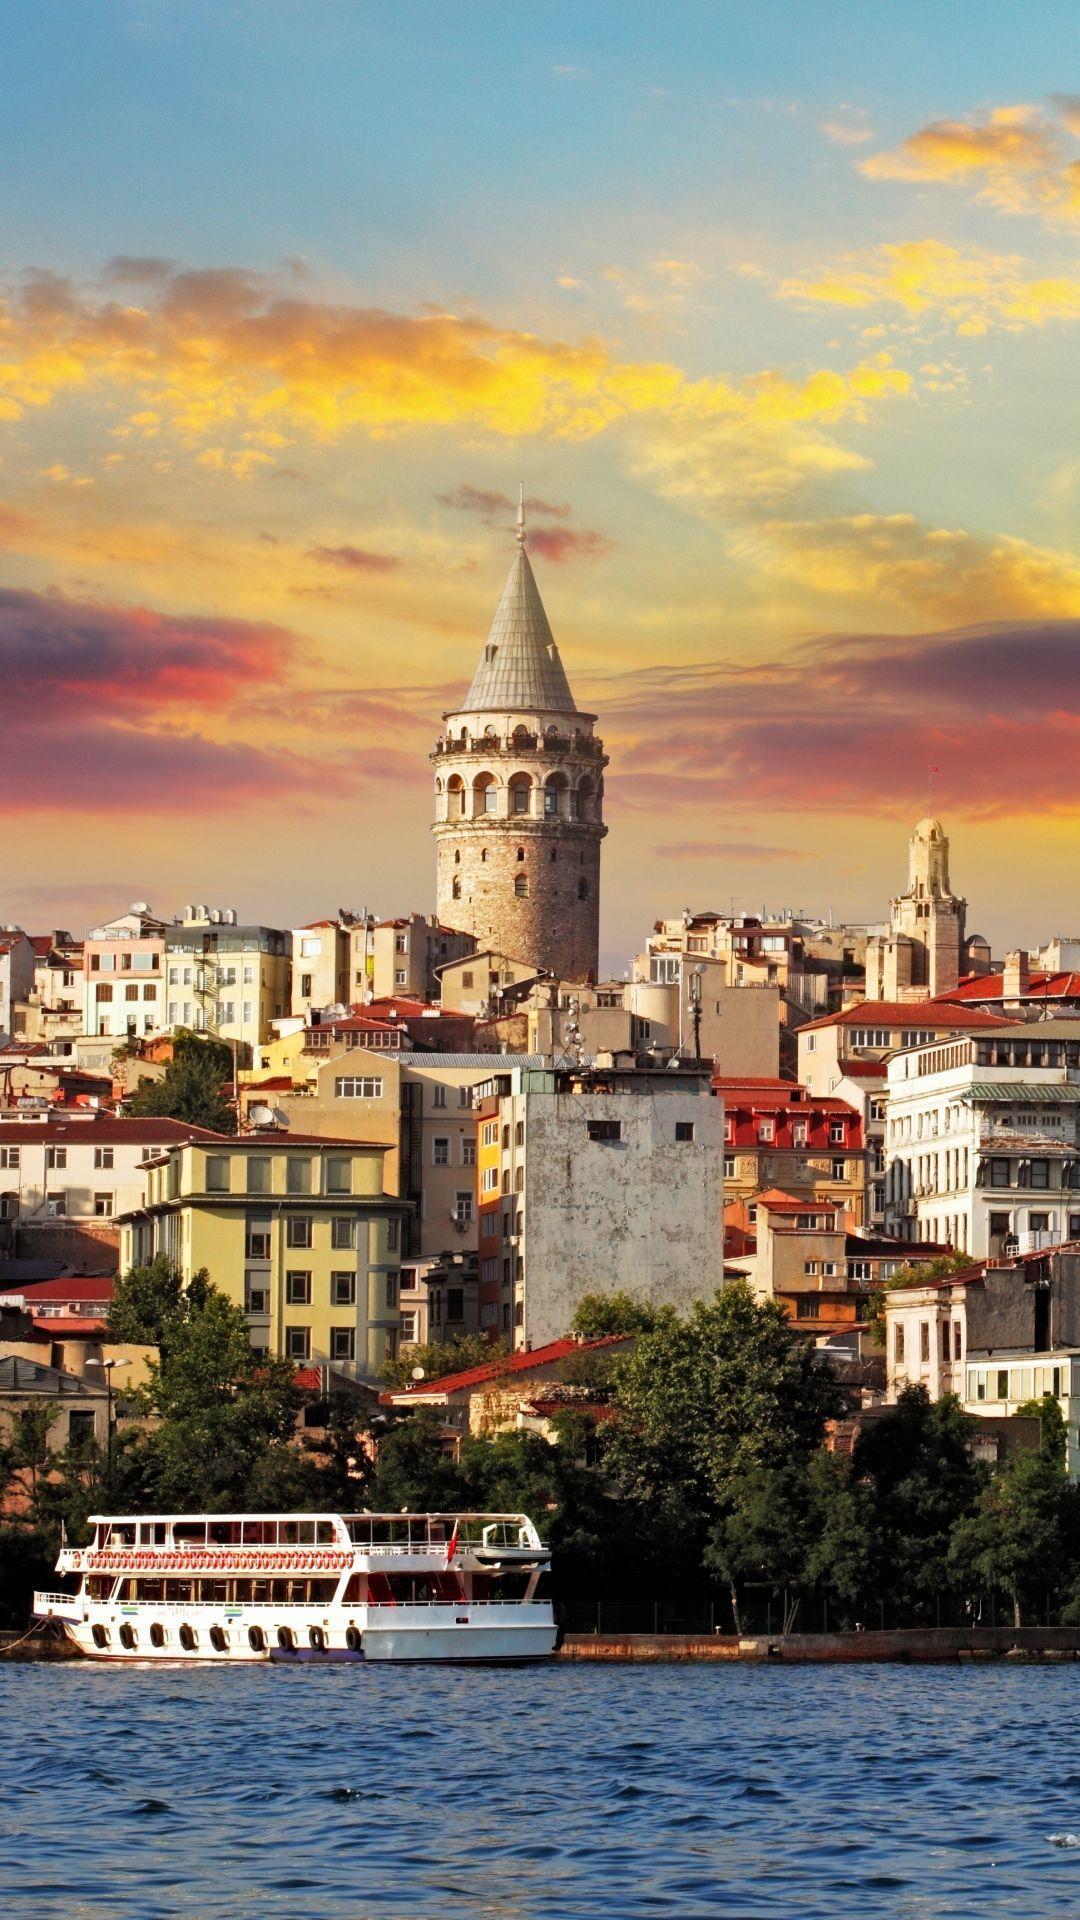 Turkey Iphone Wallpapers Top Free Turkey Iphone